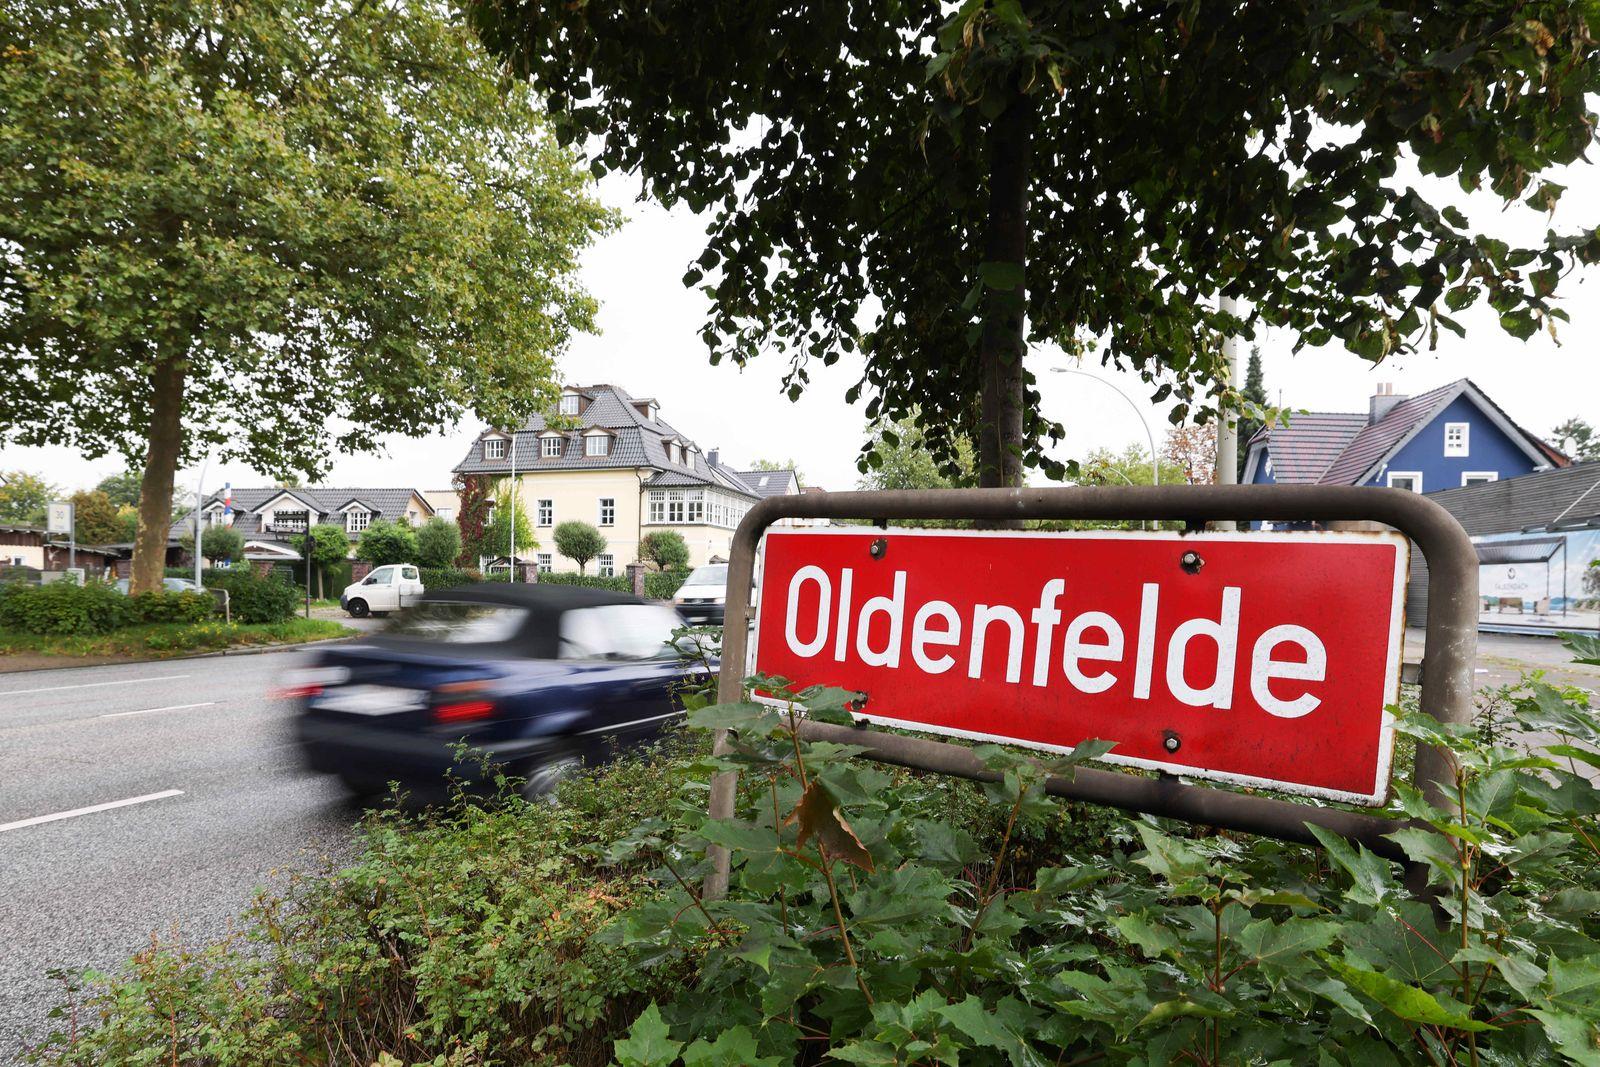 Oldenfelde